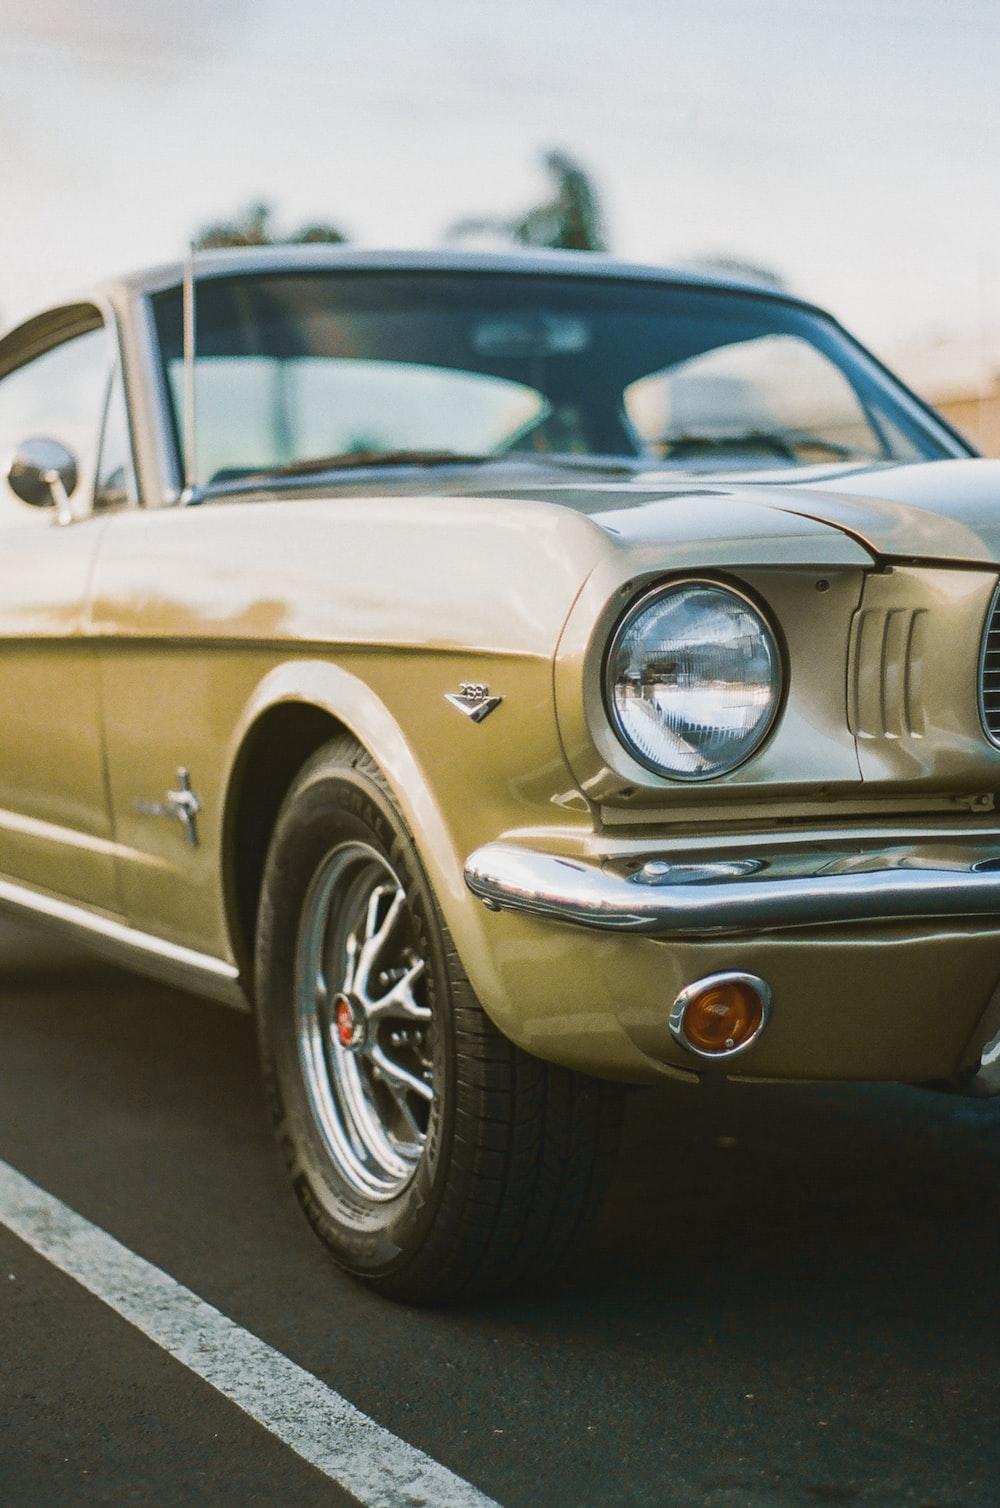 beige vintage car on road